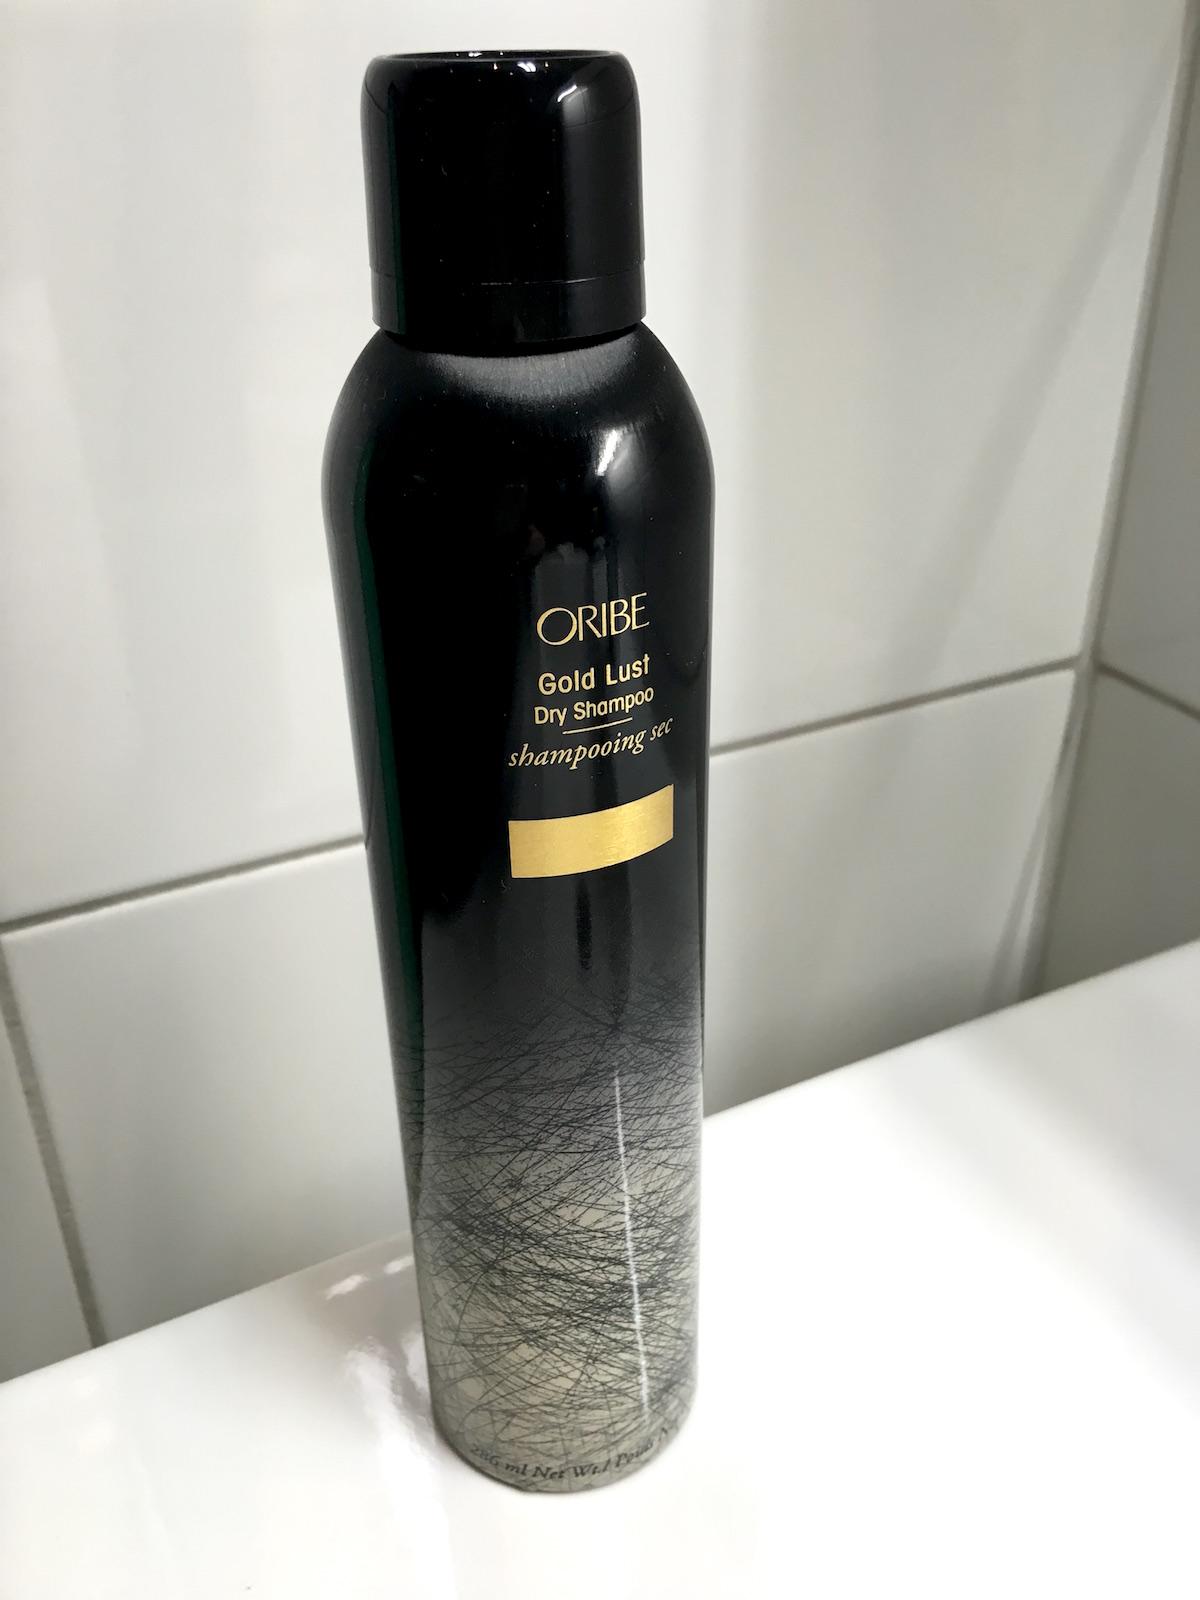 Oribe Gold Lust Dry Shampoo | skonhetssnack.se